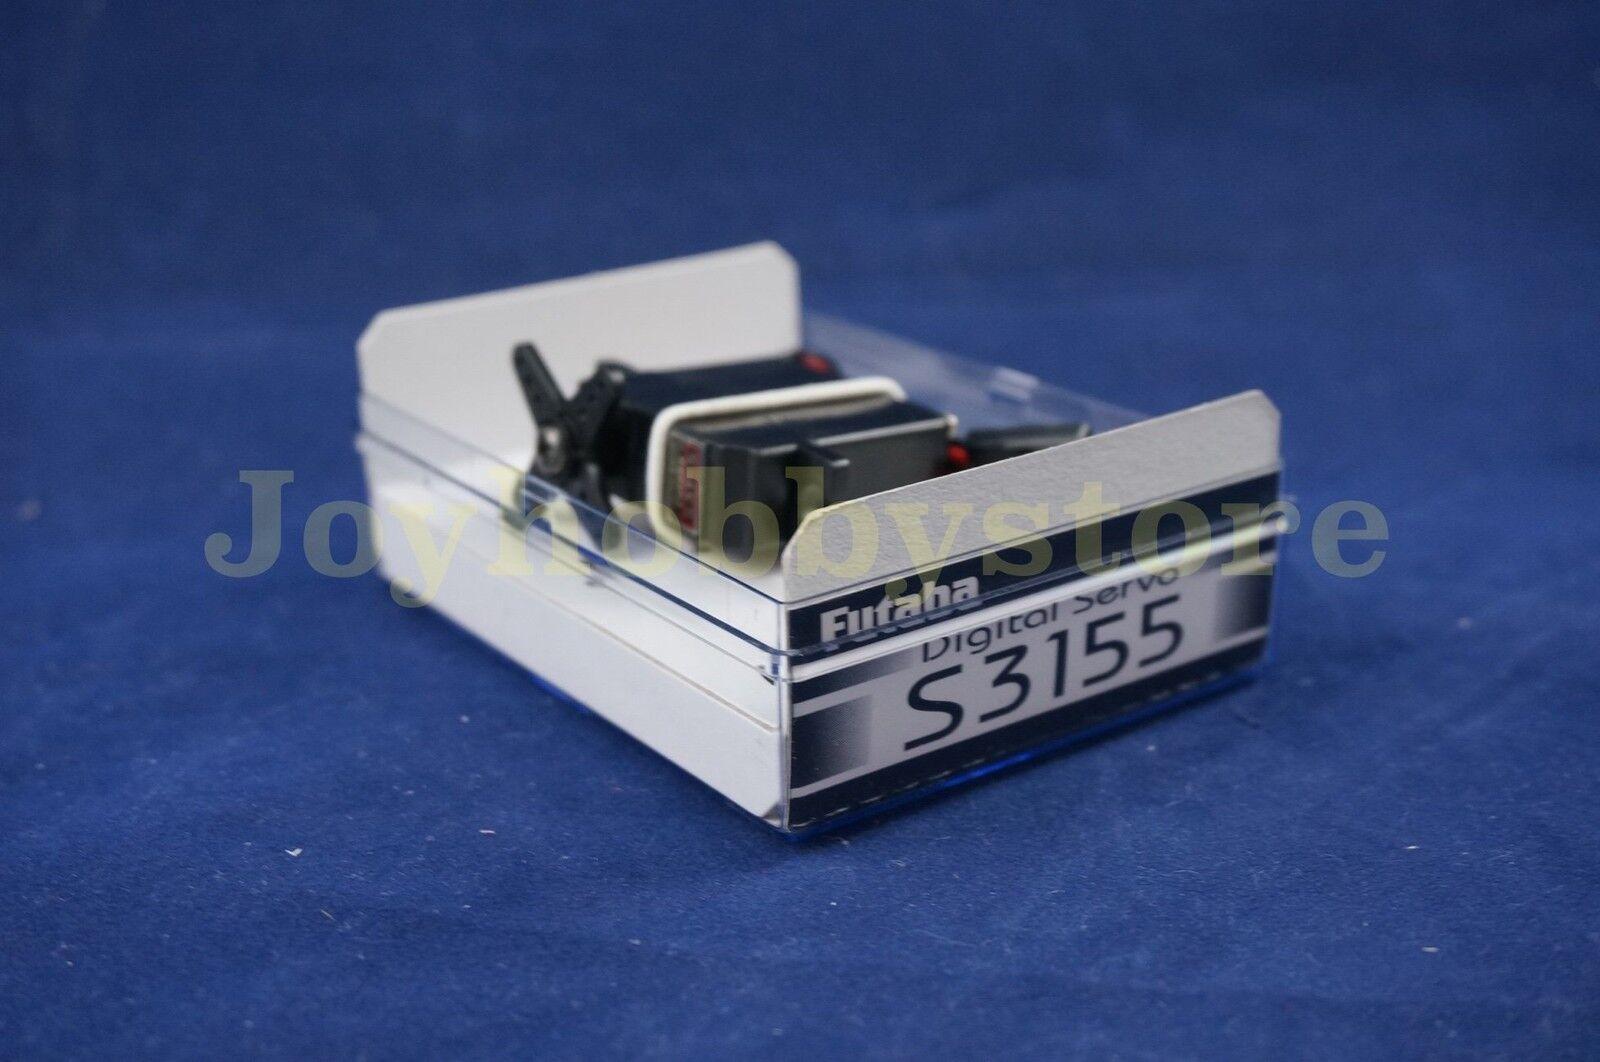 Futaba S3155 Digital Servo HS Slim